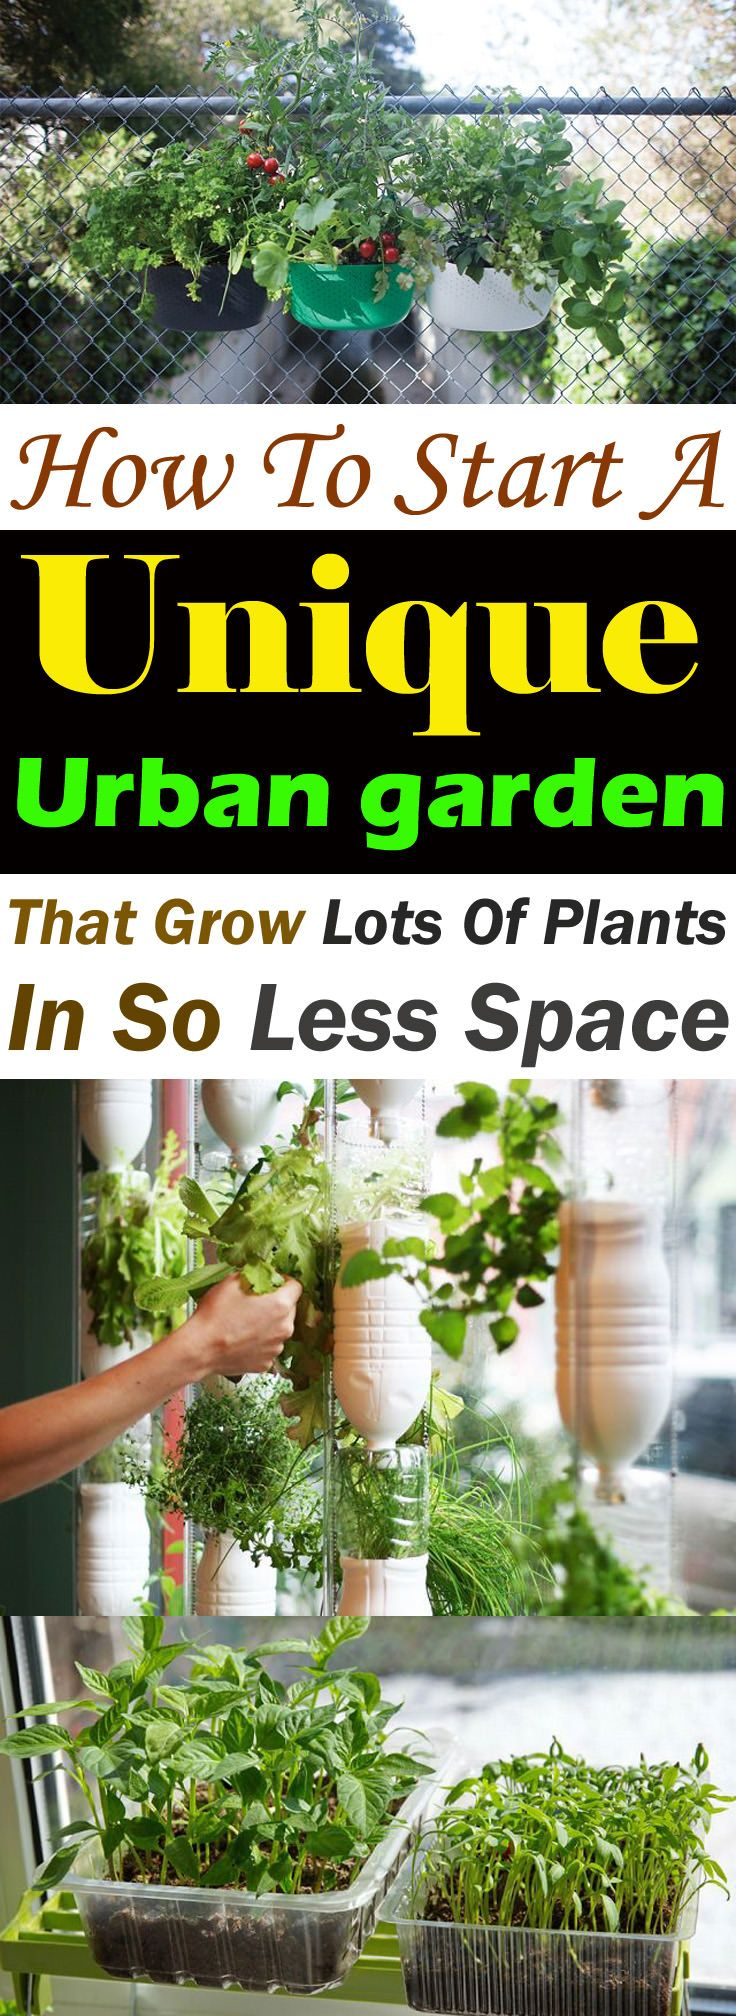 How To Start A Unique Urban Garden